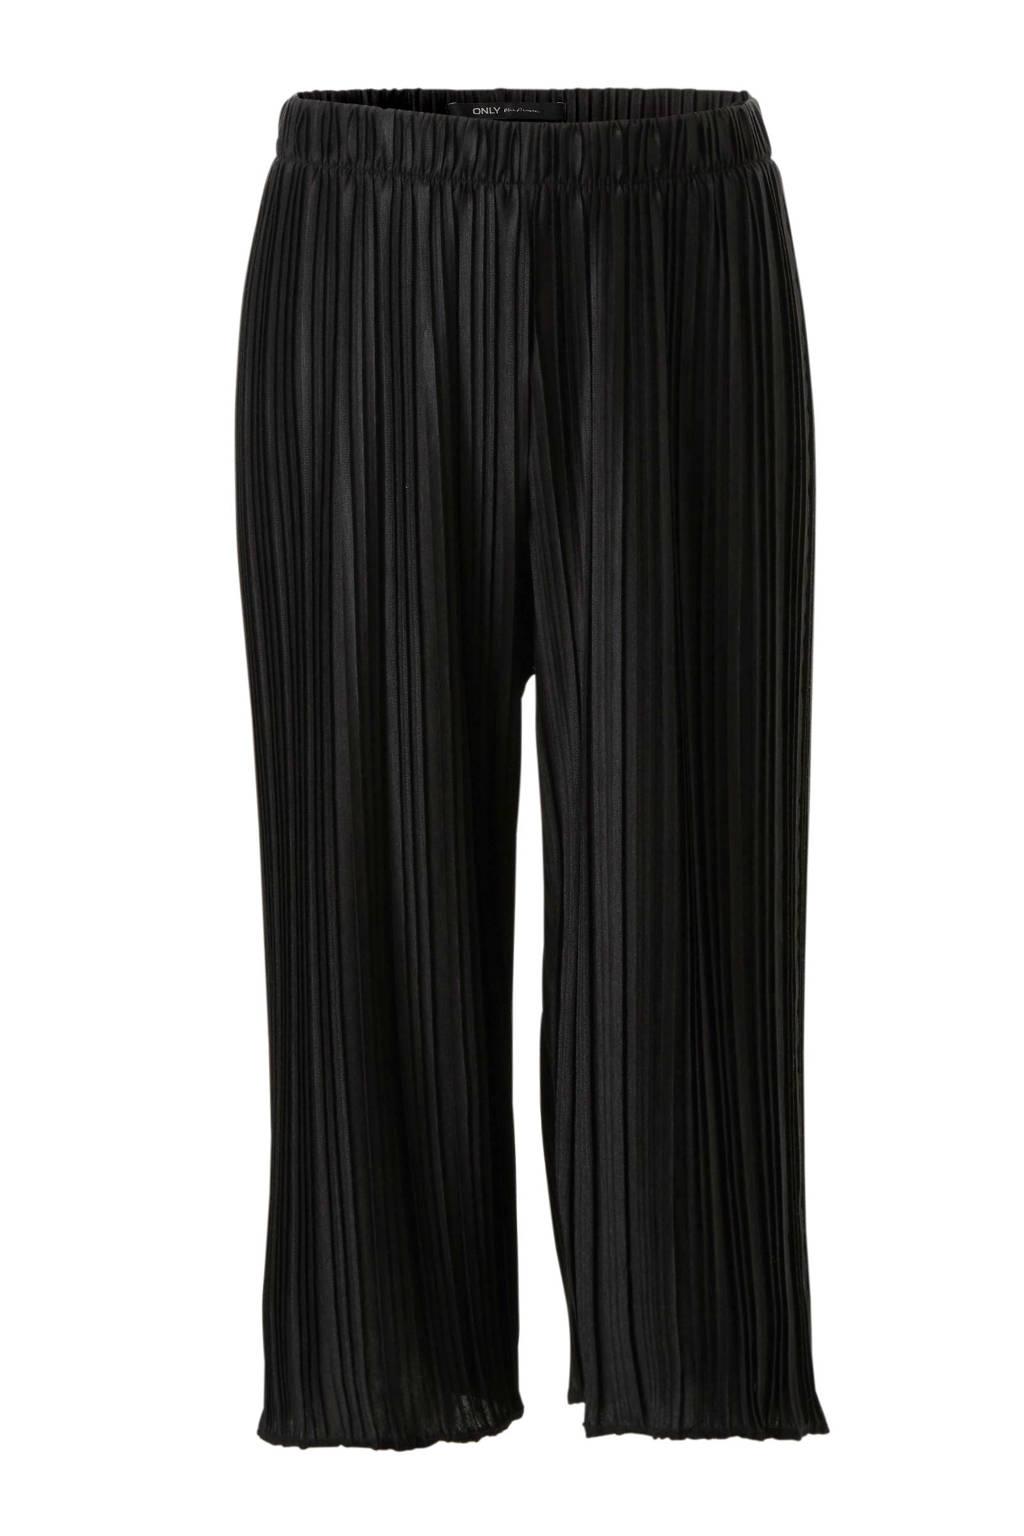 KIDSONLY plissé culotte Emma zwart, Zwart